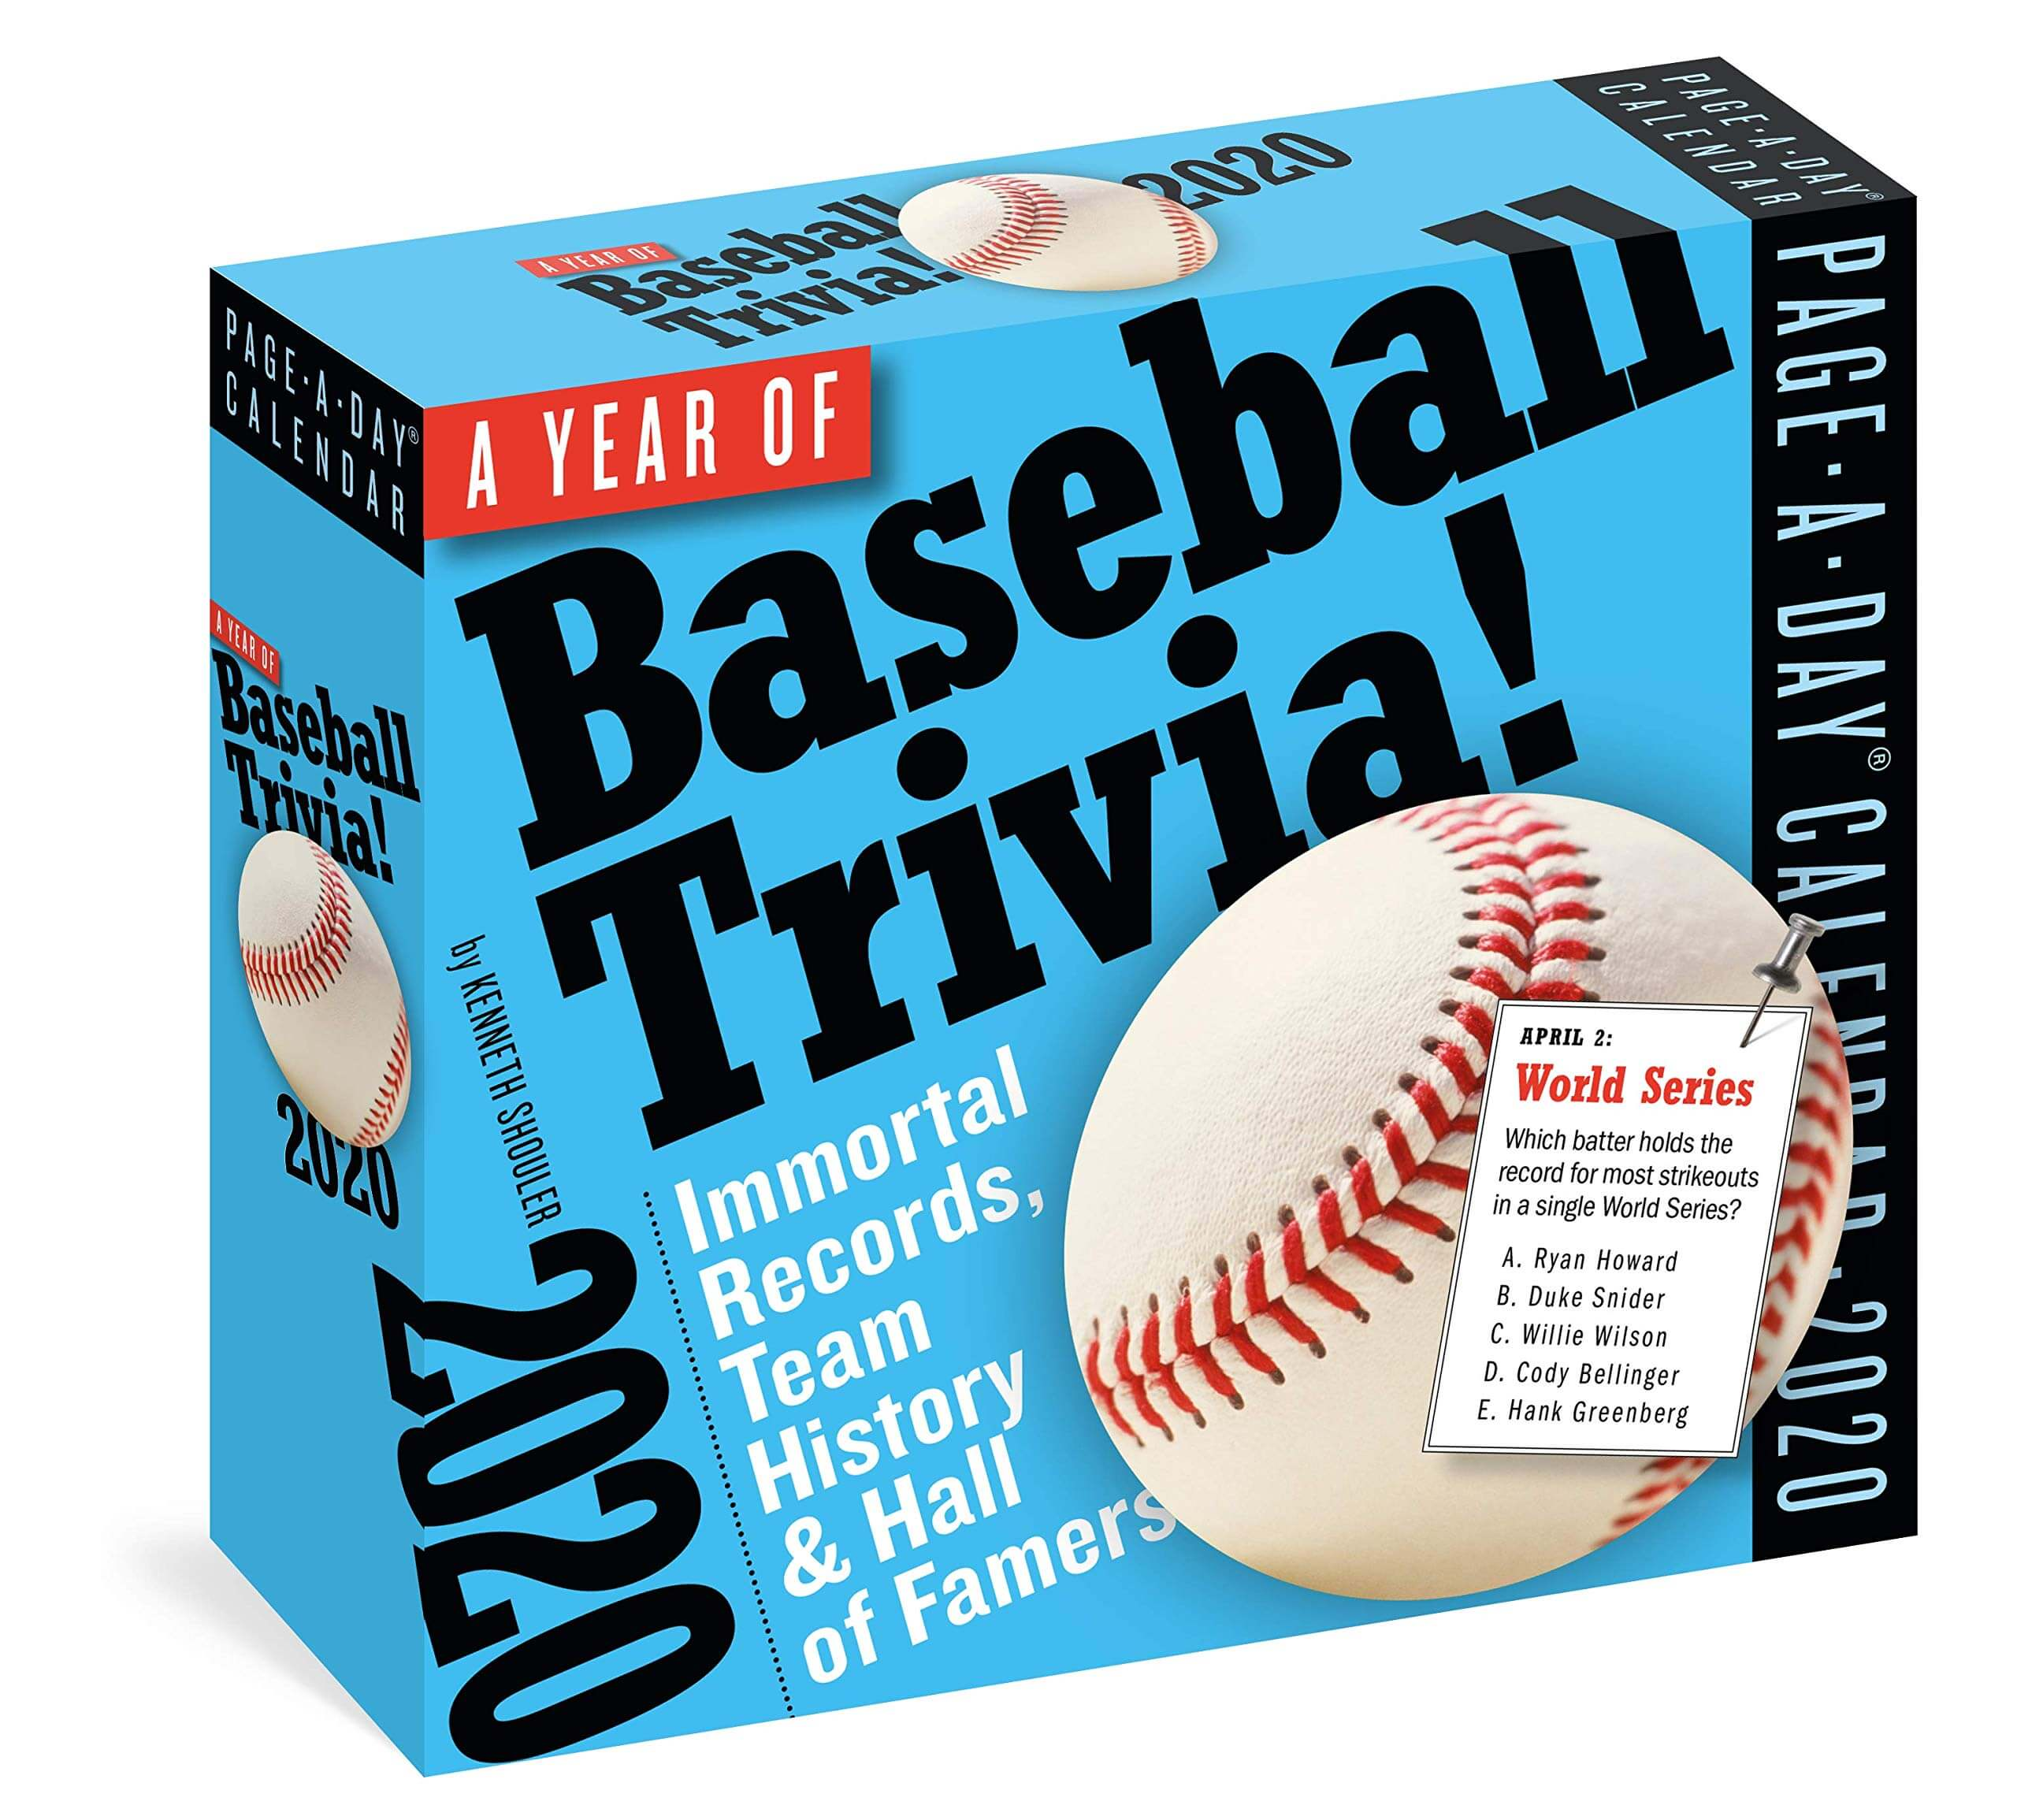 A Year of Baseball Trivia!